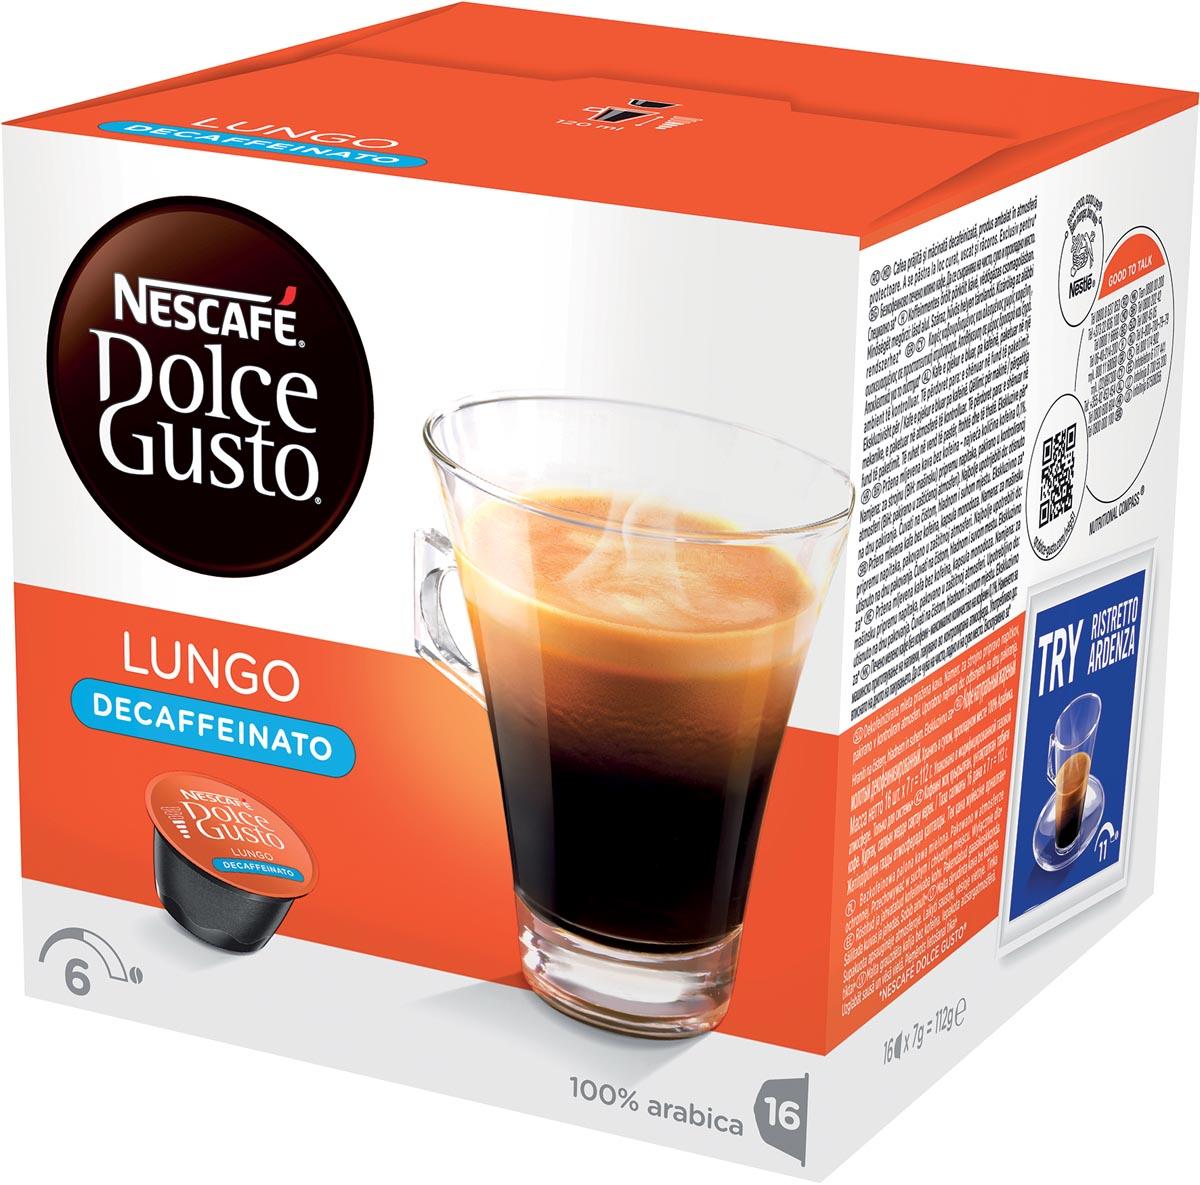 Nescafé Dolce Gusto koffiepads, Lungo Decaffeinato, pak van 16 stuks